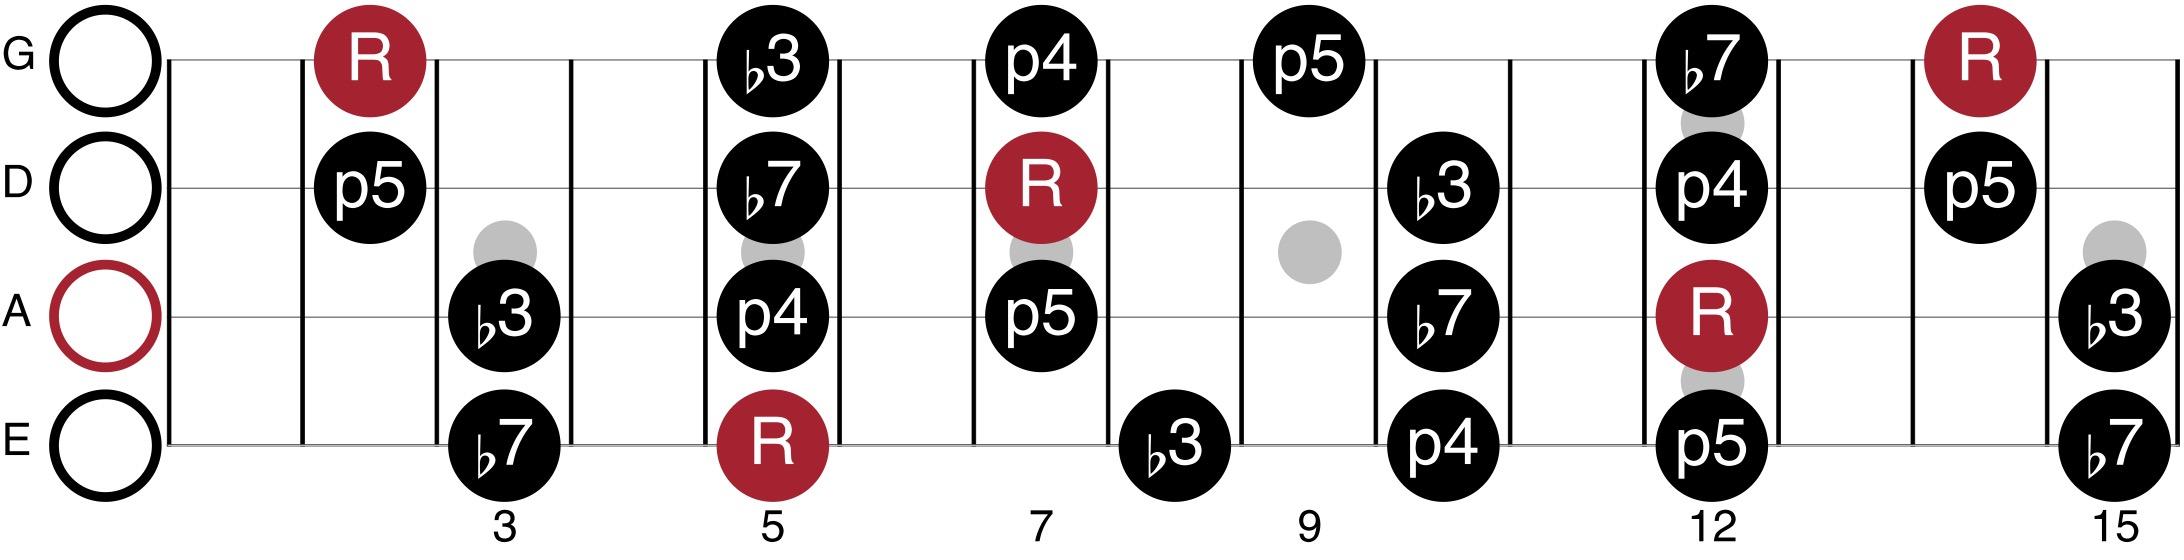 A Minor Pentatonic Scale For Bass Guitar